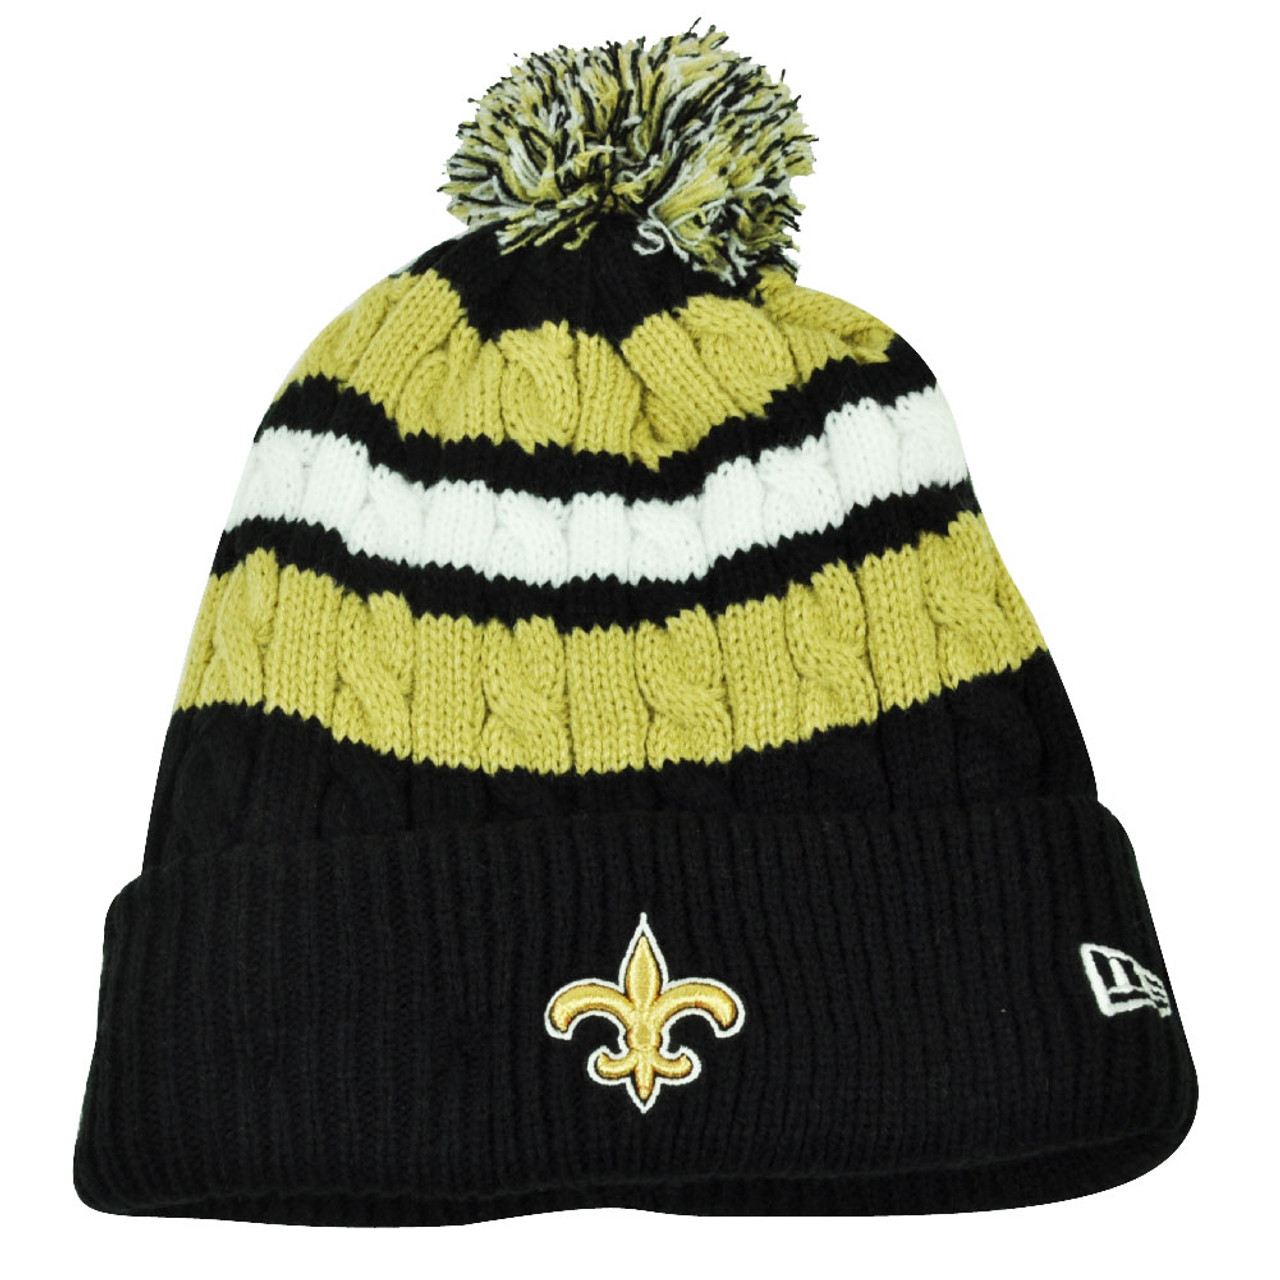 new style 9b572 966f6 NFL New Era Wintry Warm Womens Knit Beanie Striped Cuffed New Orleans  Saints Hat - Cap Store Online.com